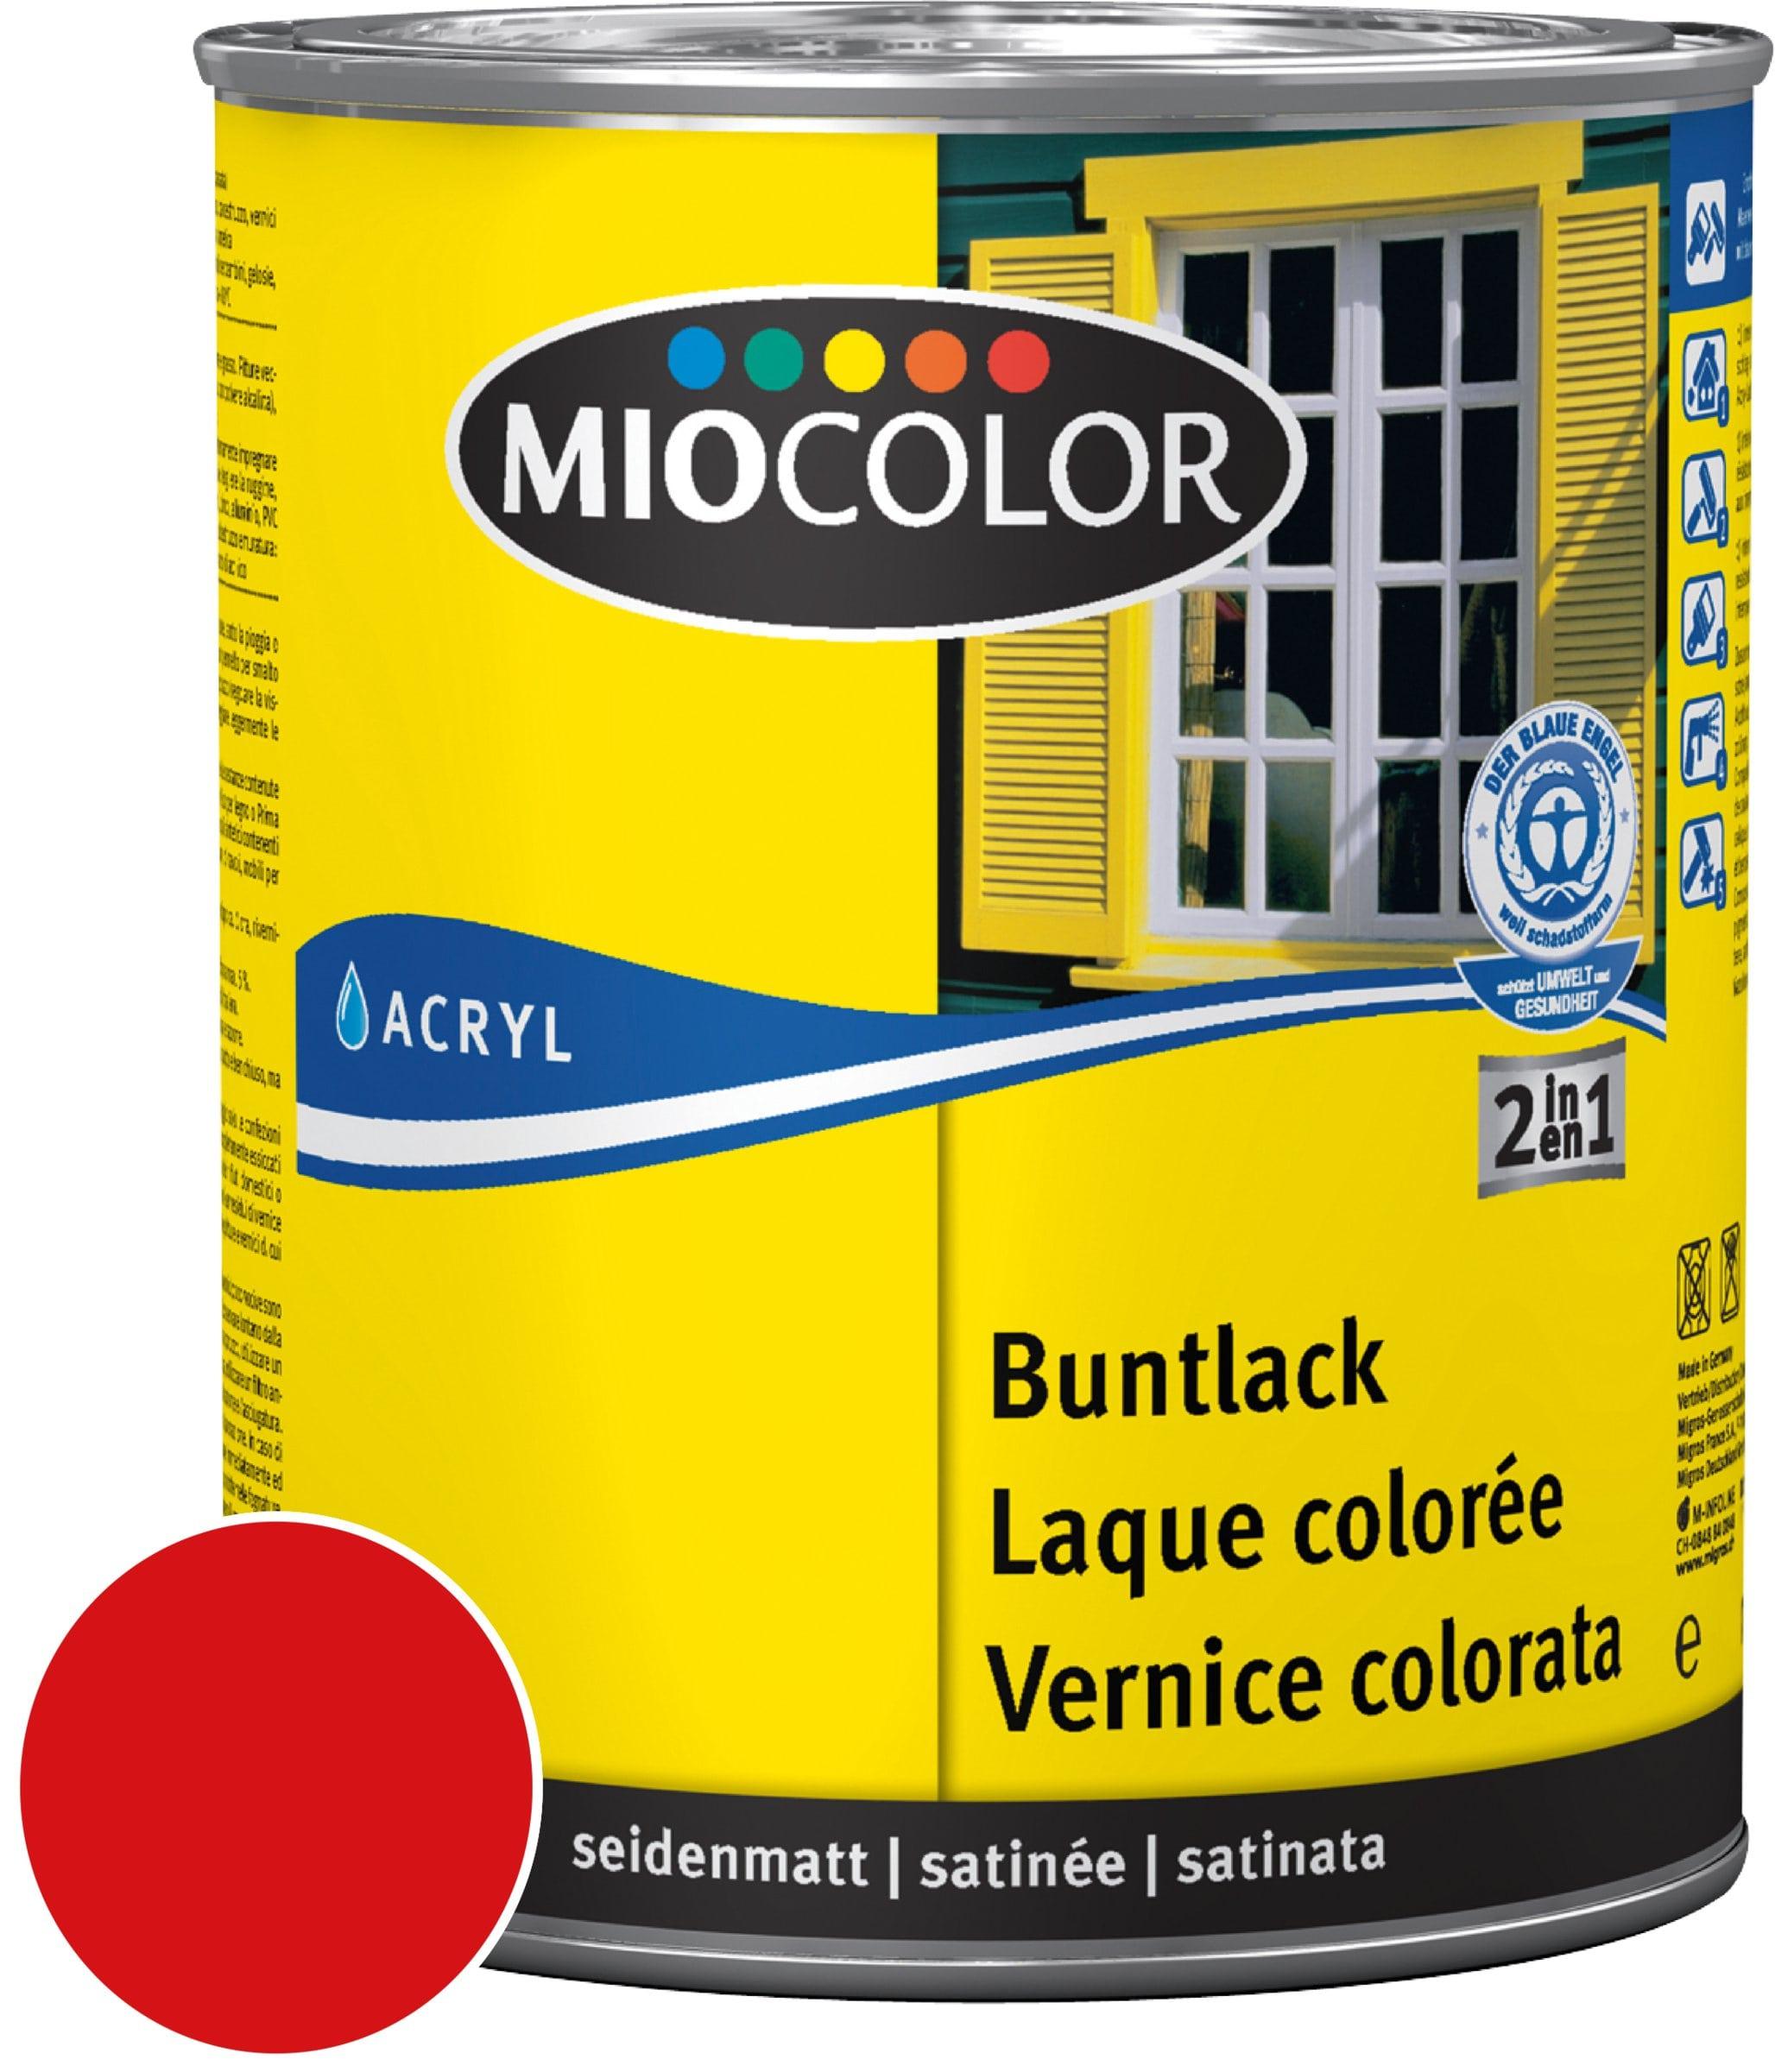 Miocolor Acryl Buntlack seidenmatt Feuerrot 750 ml